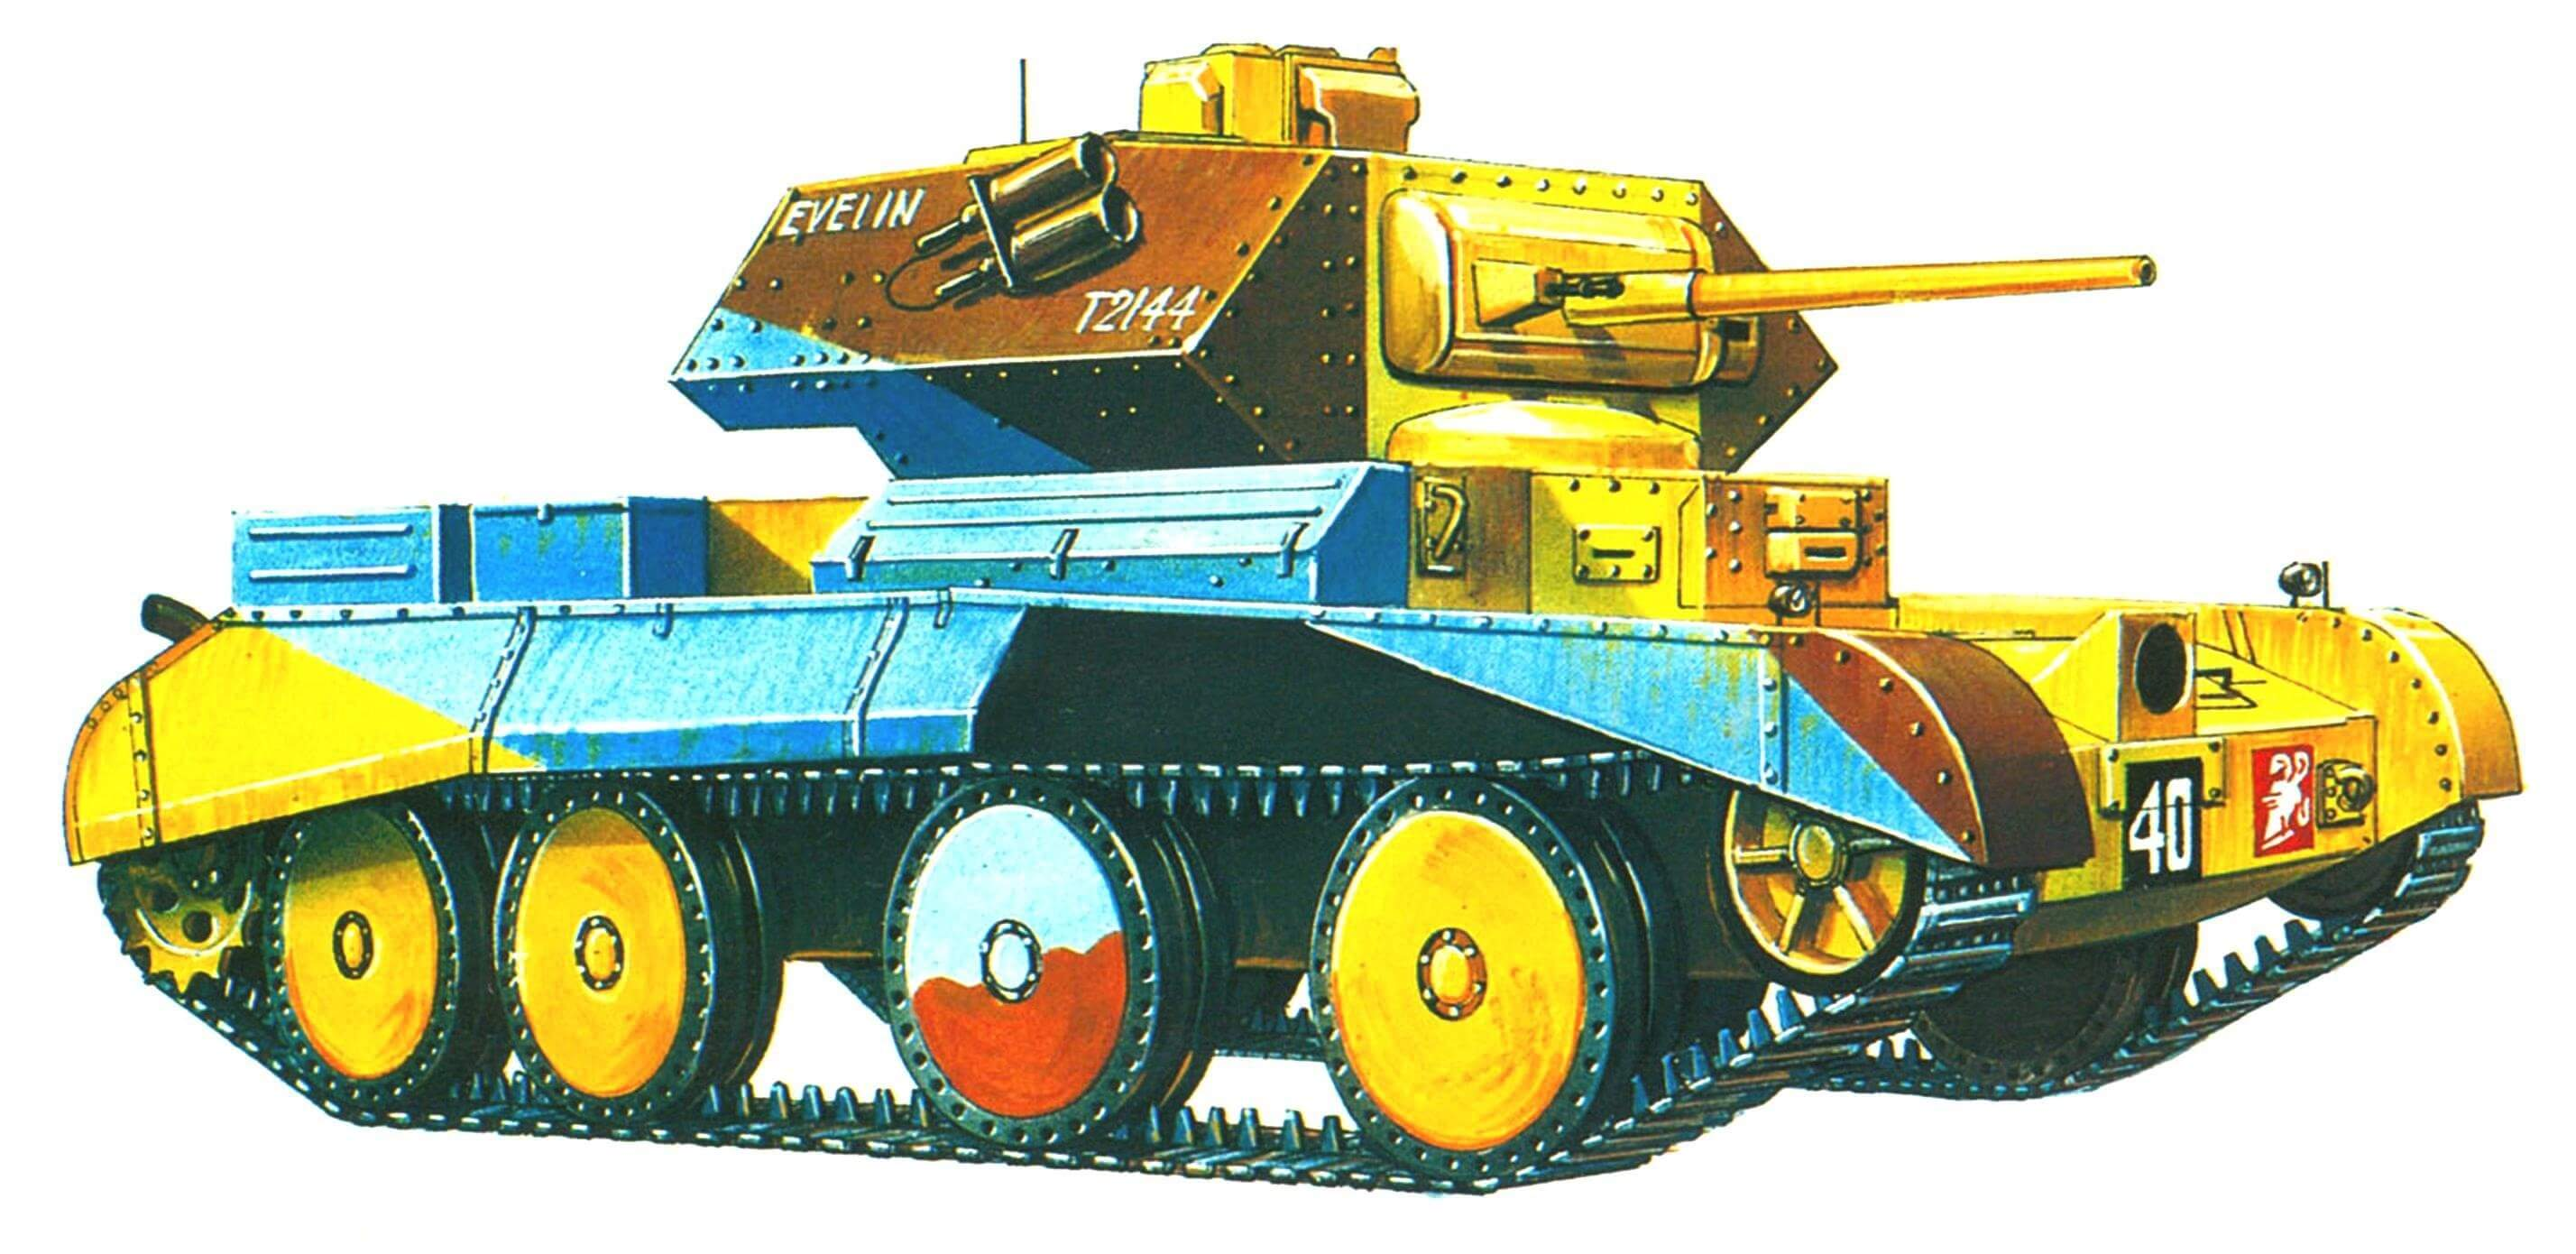 Cruiser Mk IV. 2-я танковая дивизия, Северная Африка, февраль 1941 года.